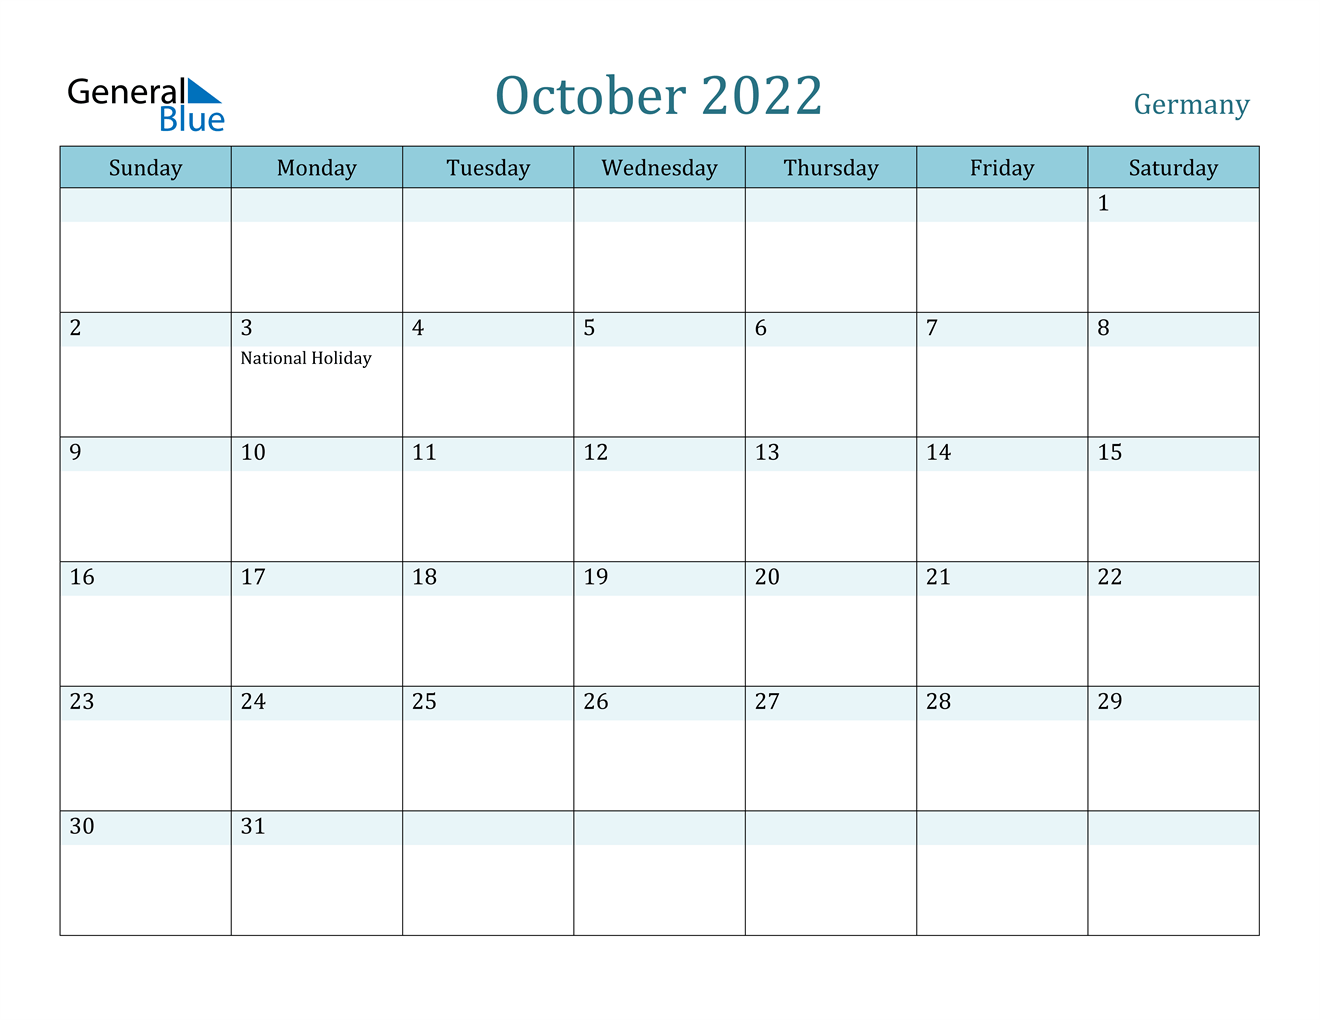 October 2022 Calendar - Germany